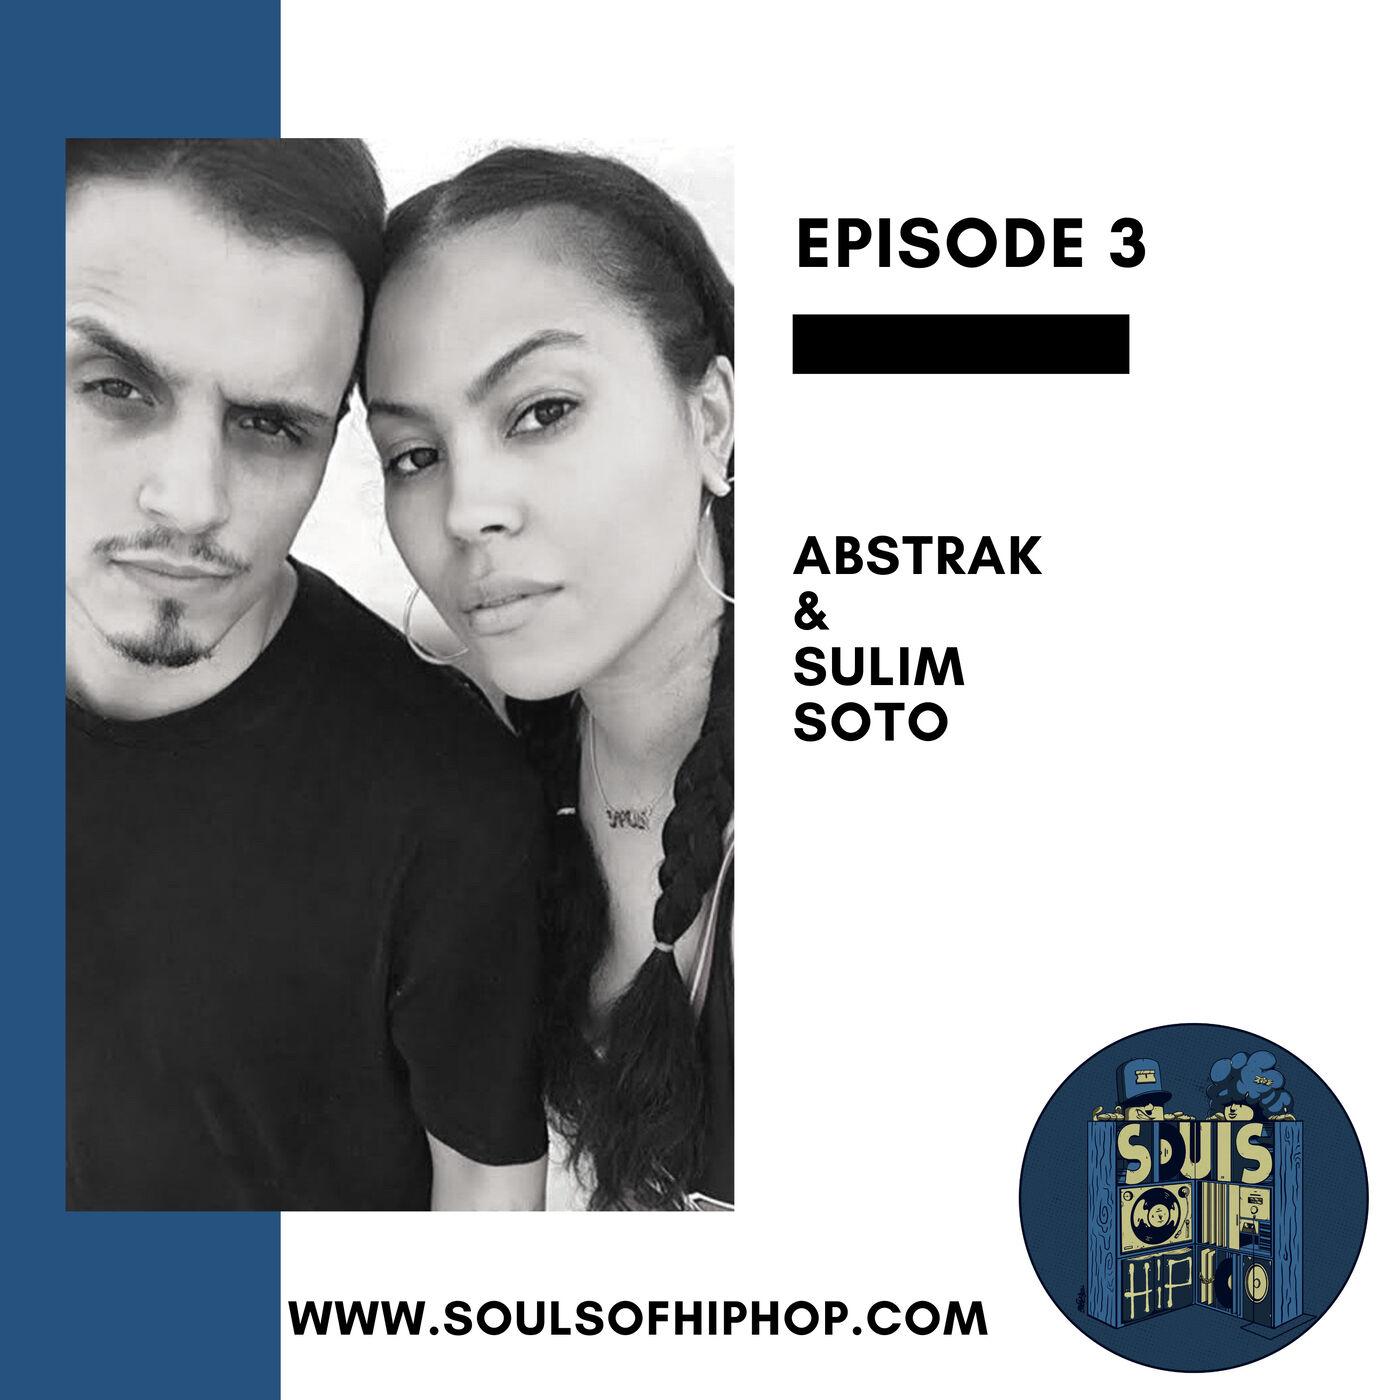 B-Boy Abstrak & Sulim Soto